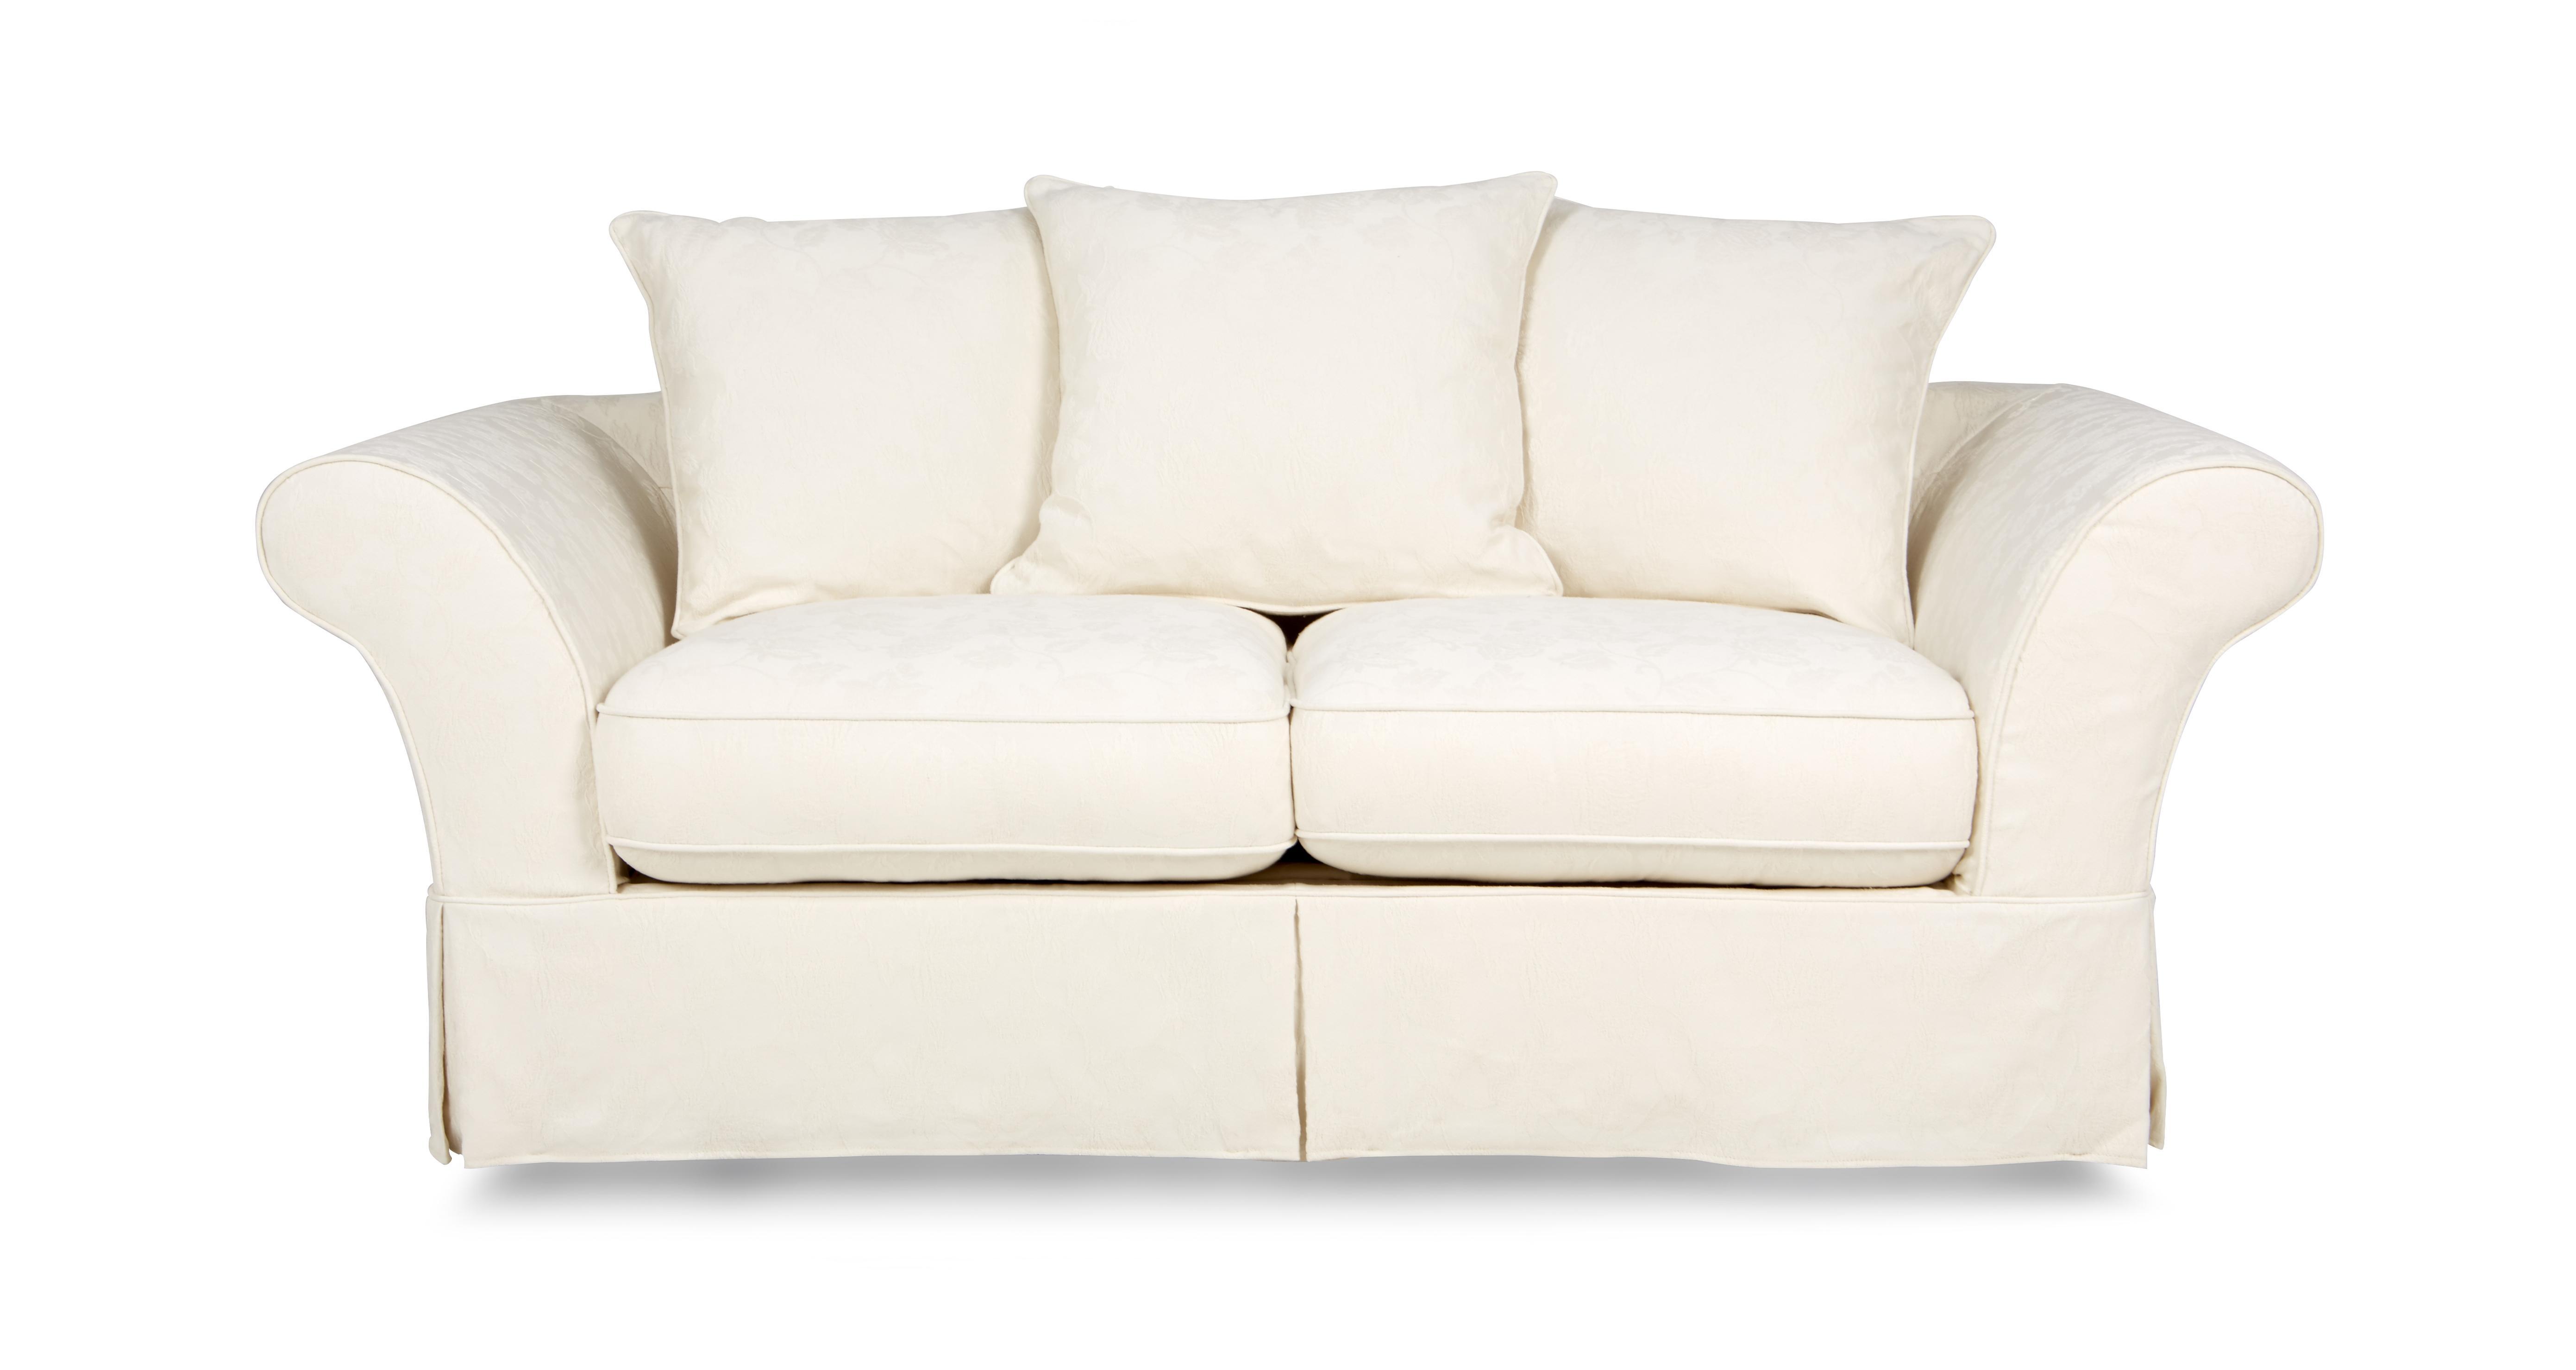 rosa 2 seater pillow back sofa dfs. Black Bedroom Furniture Sets. Home Design Ideas